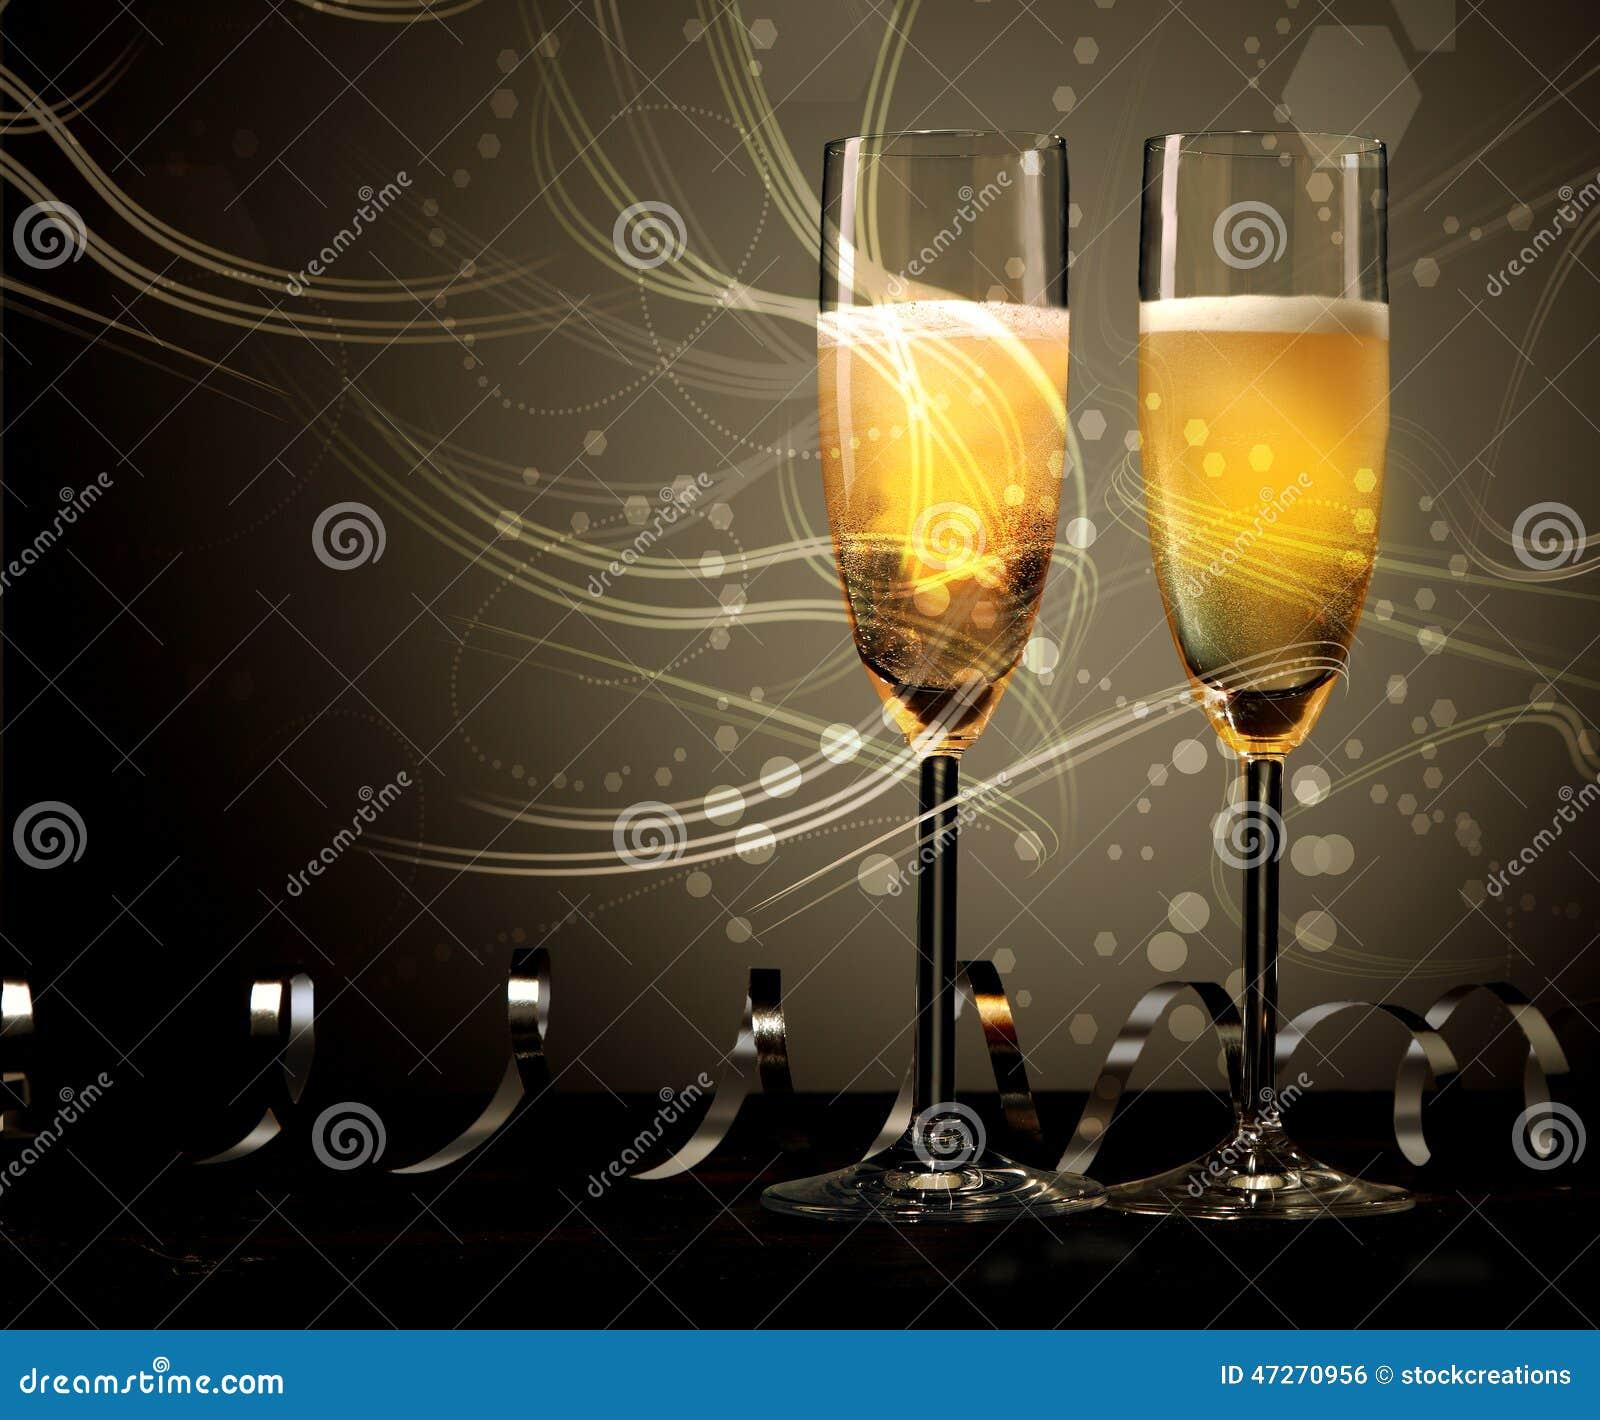 New Year, wedding or anniversary champagne